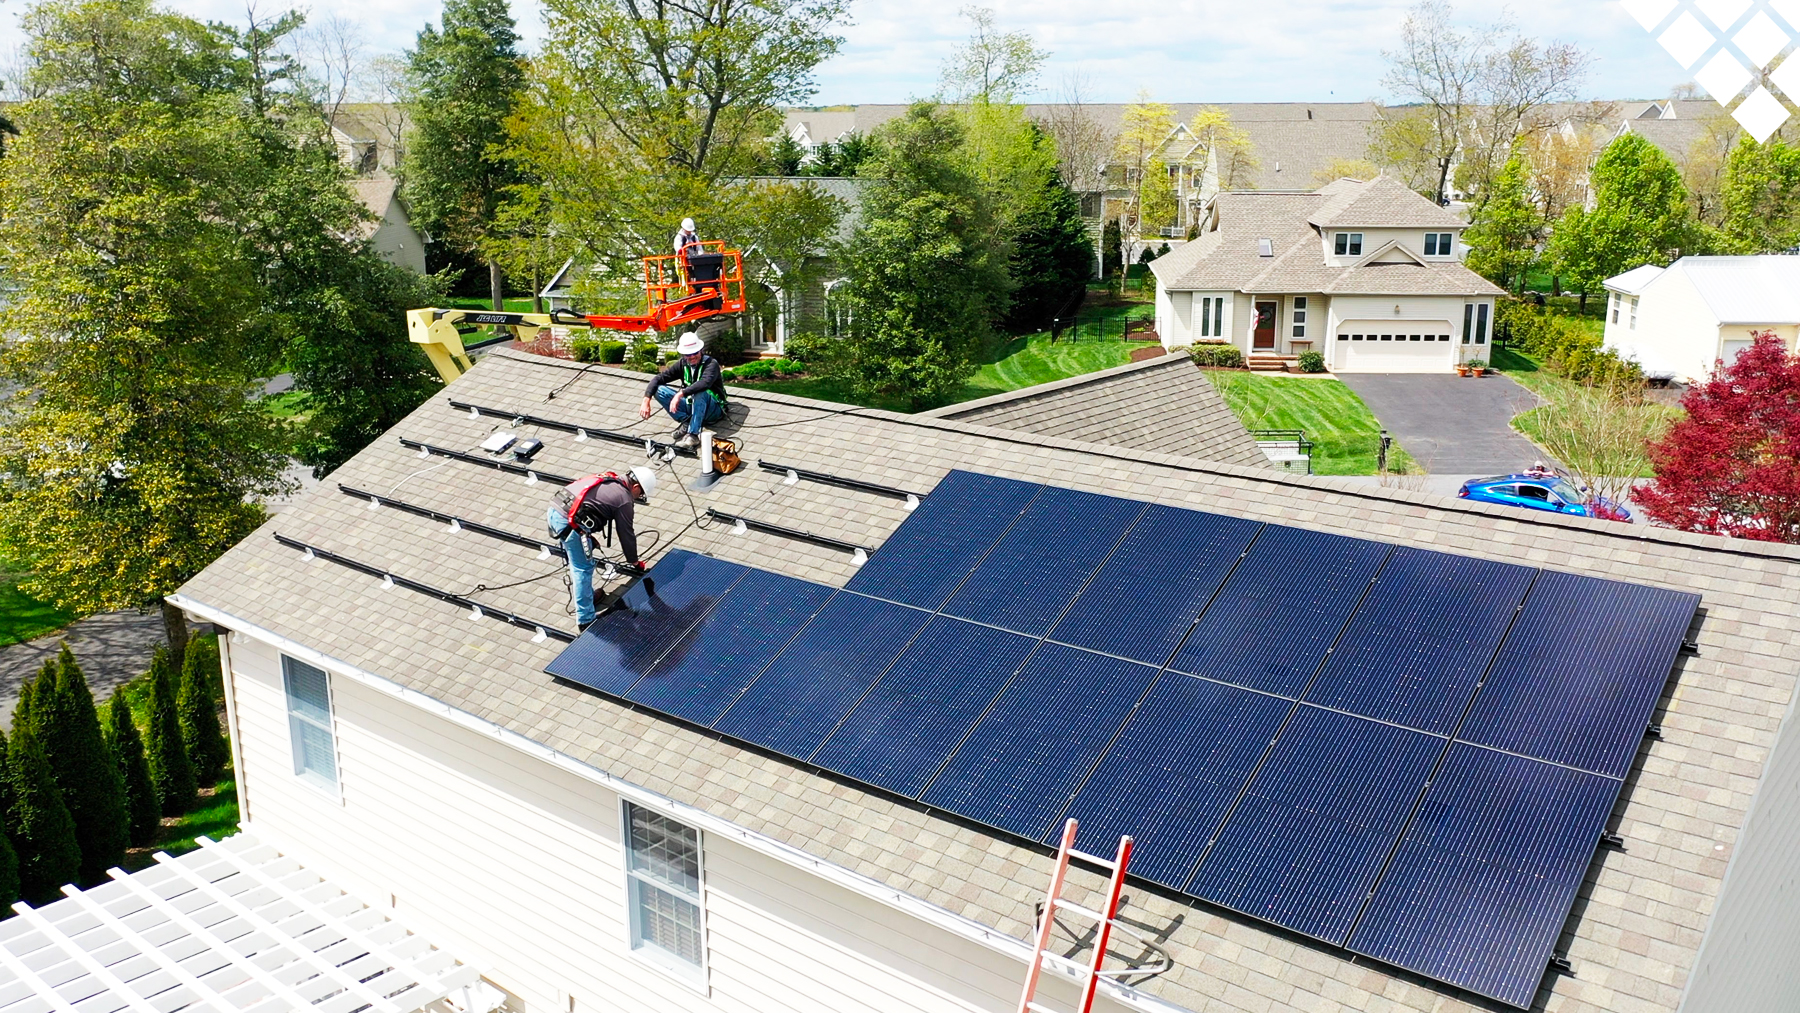 Workers installing solar panels on residential roof in neighborhood